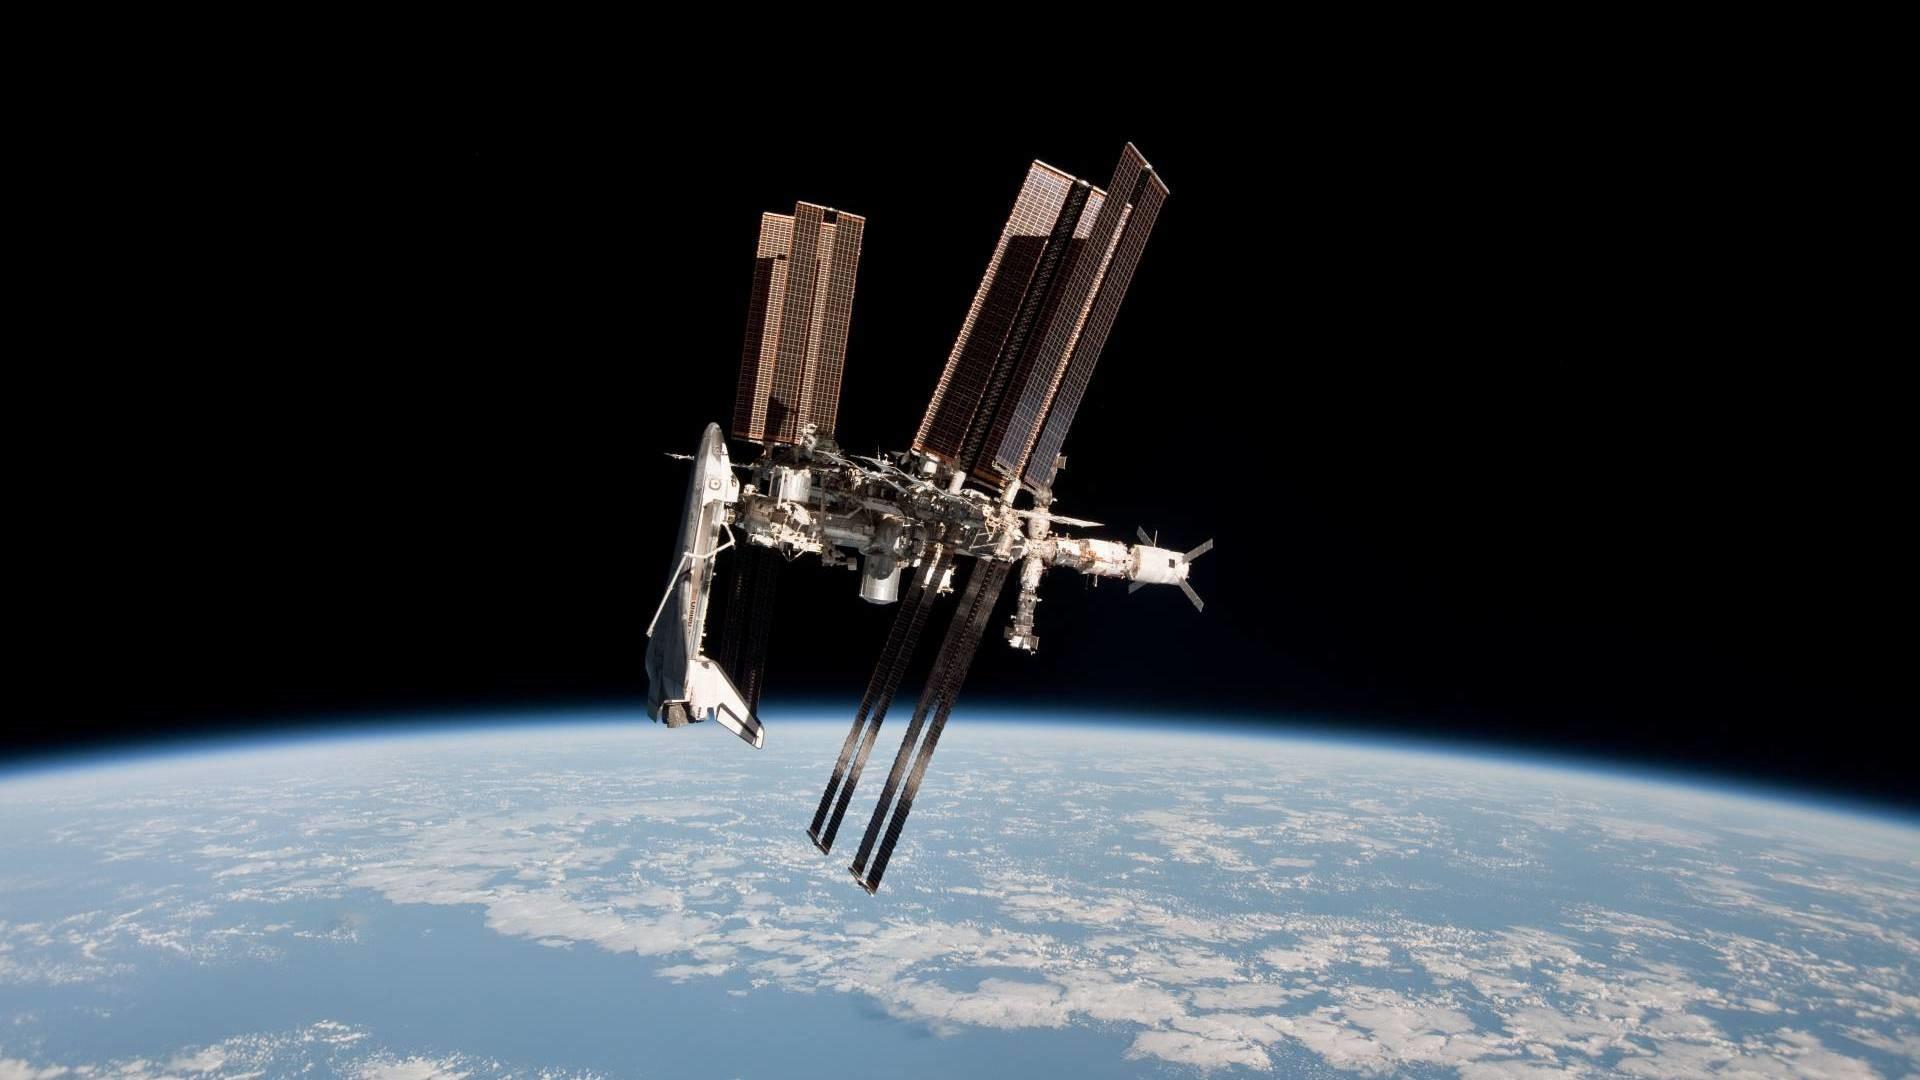 International Space Station HD Wallpaper